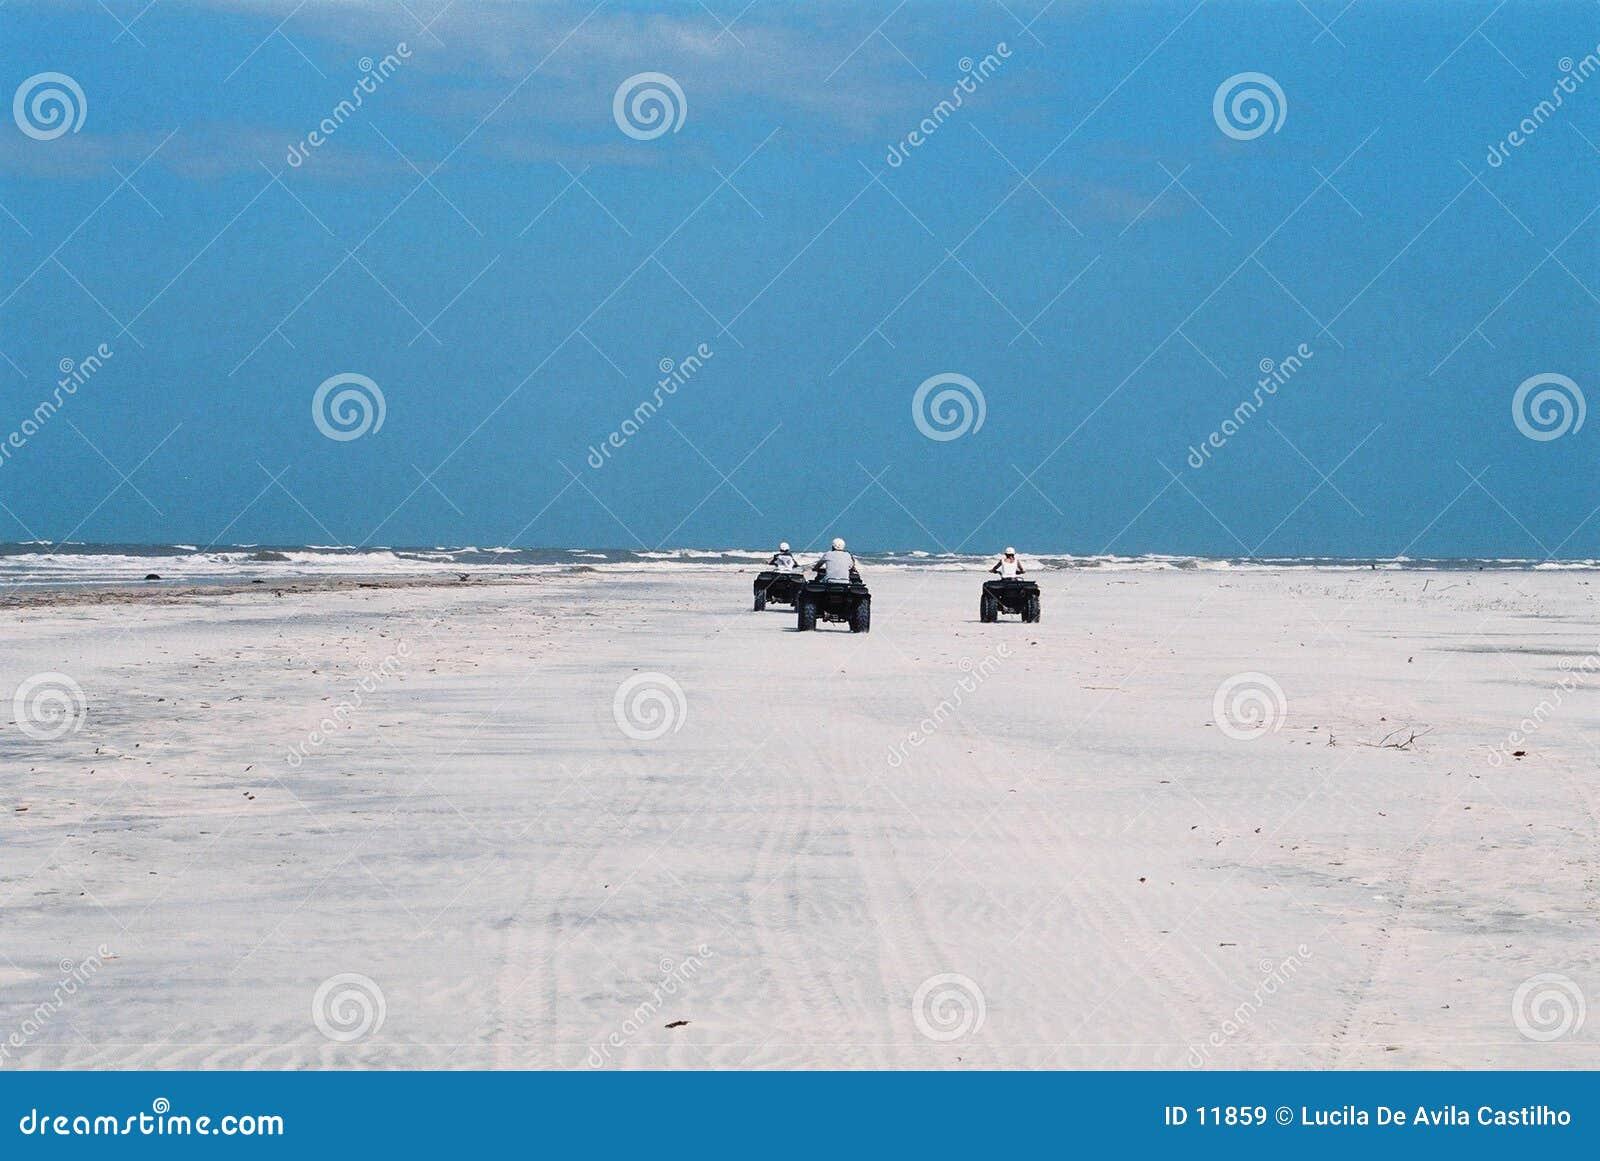 Aventura na praia abandonada